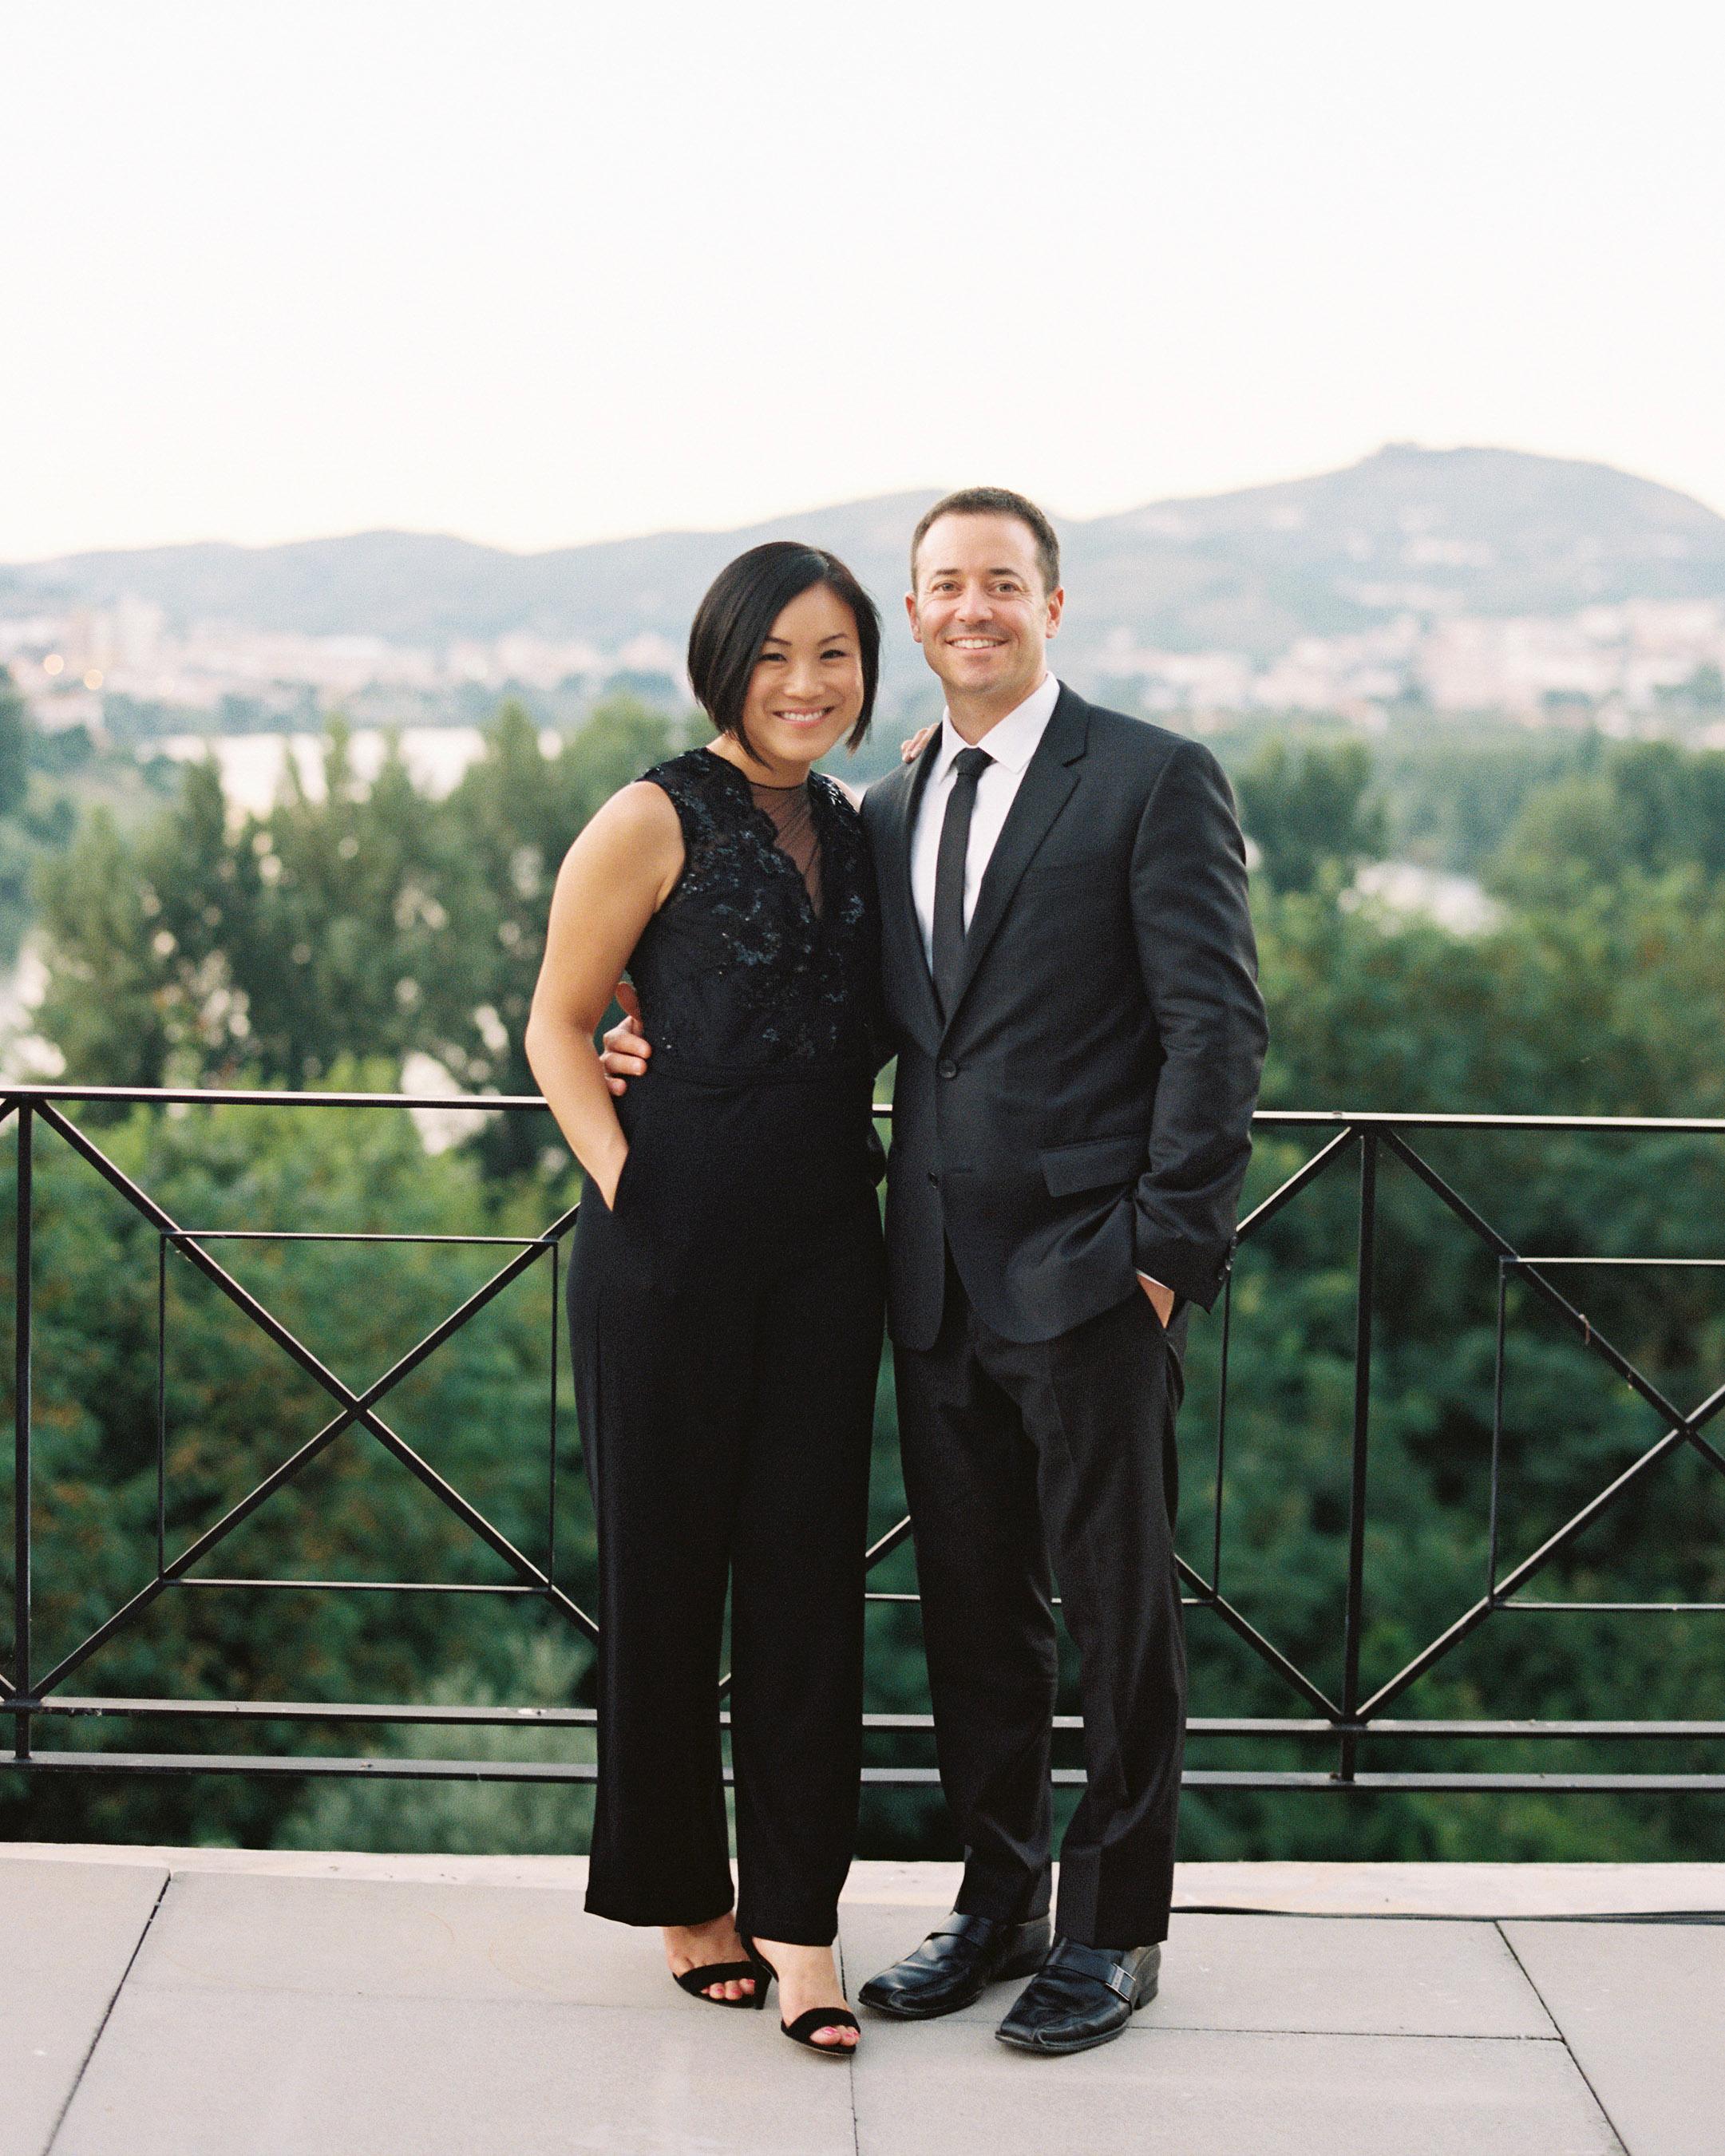 jeannette taylor wedding portugal friends